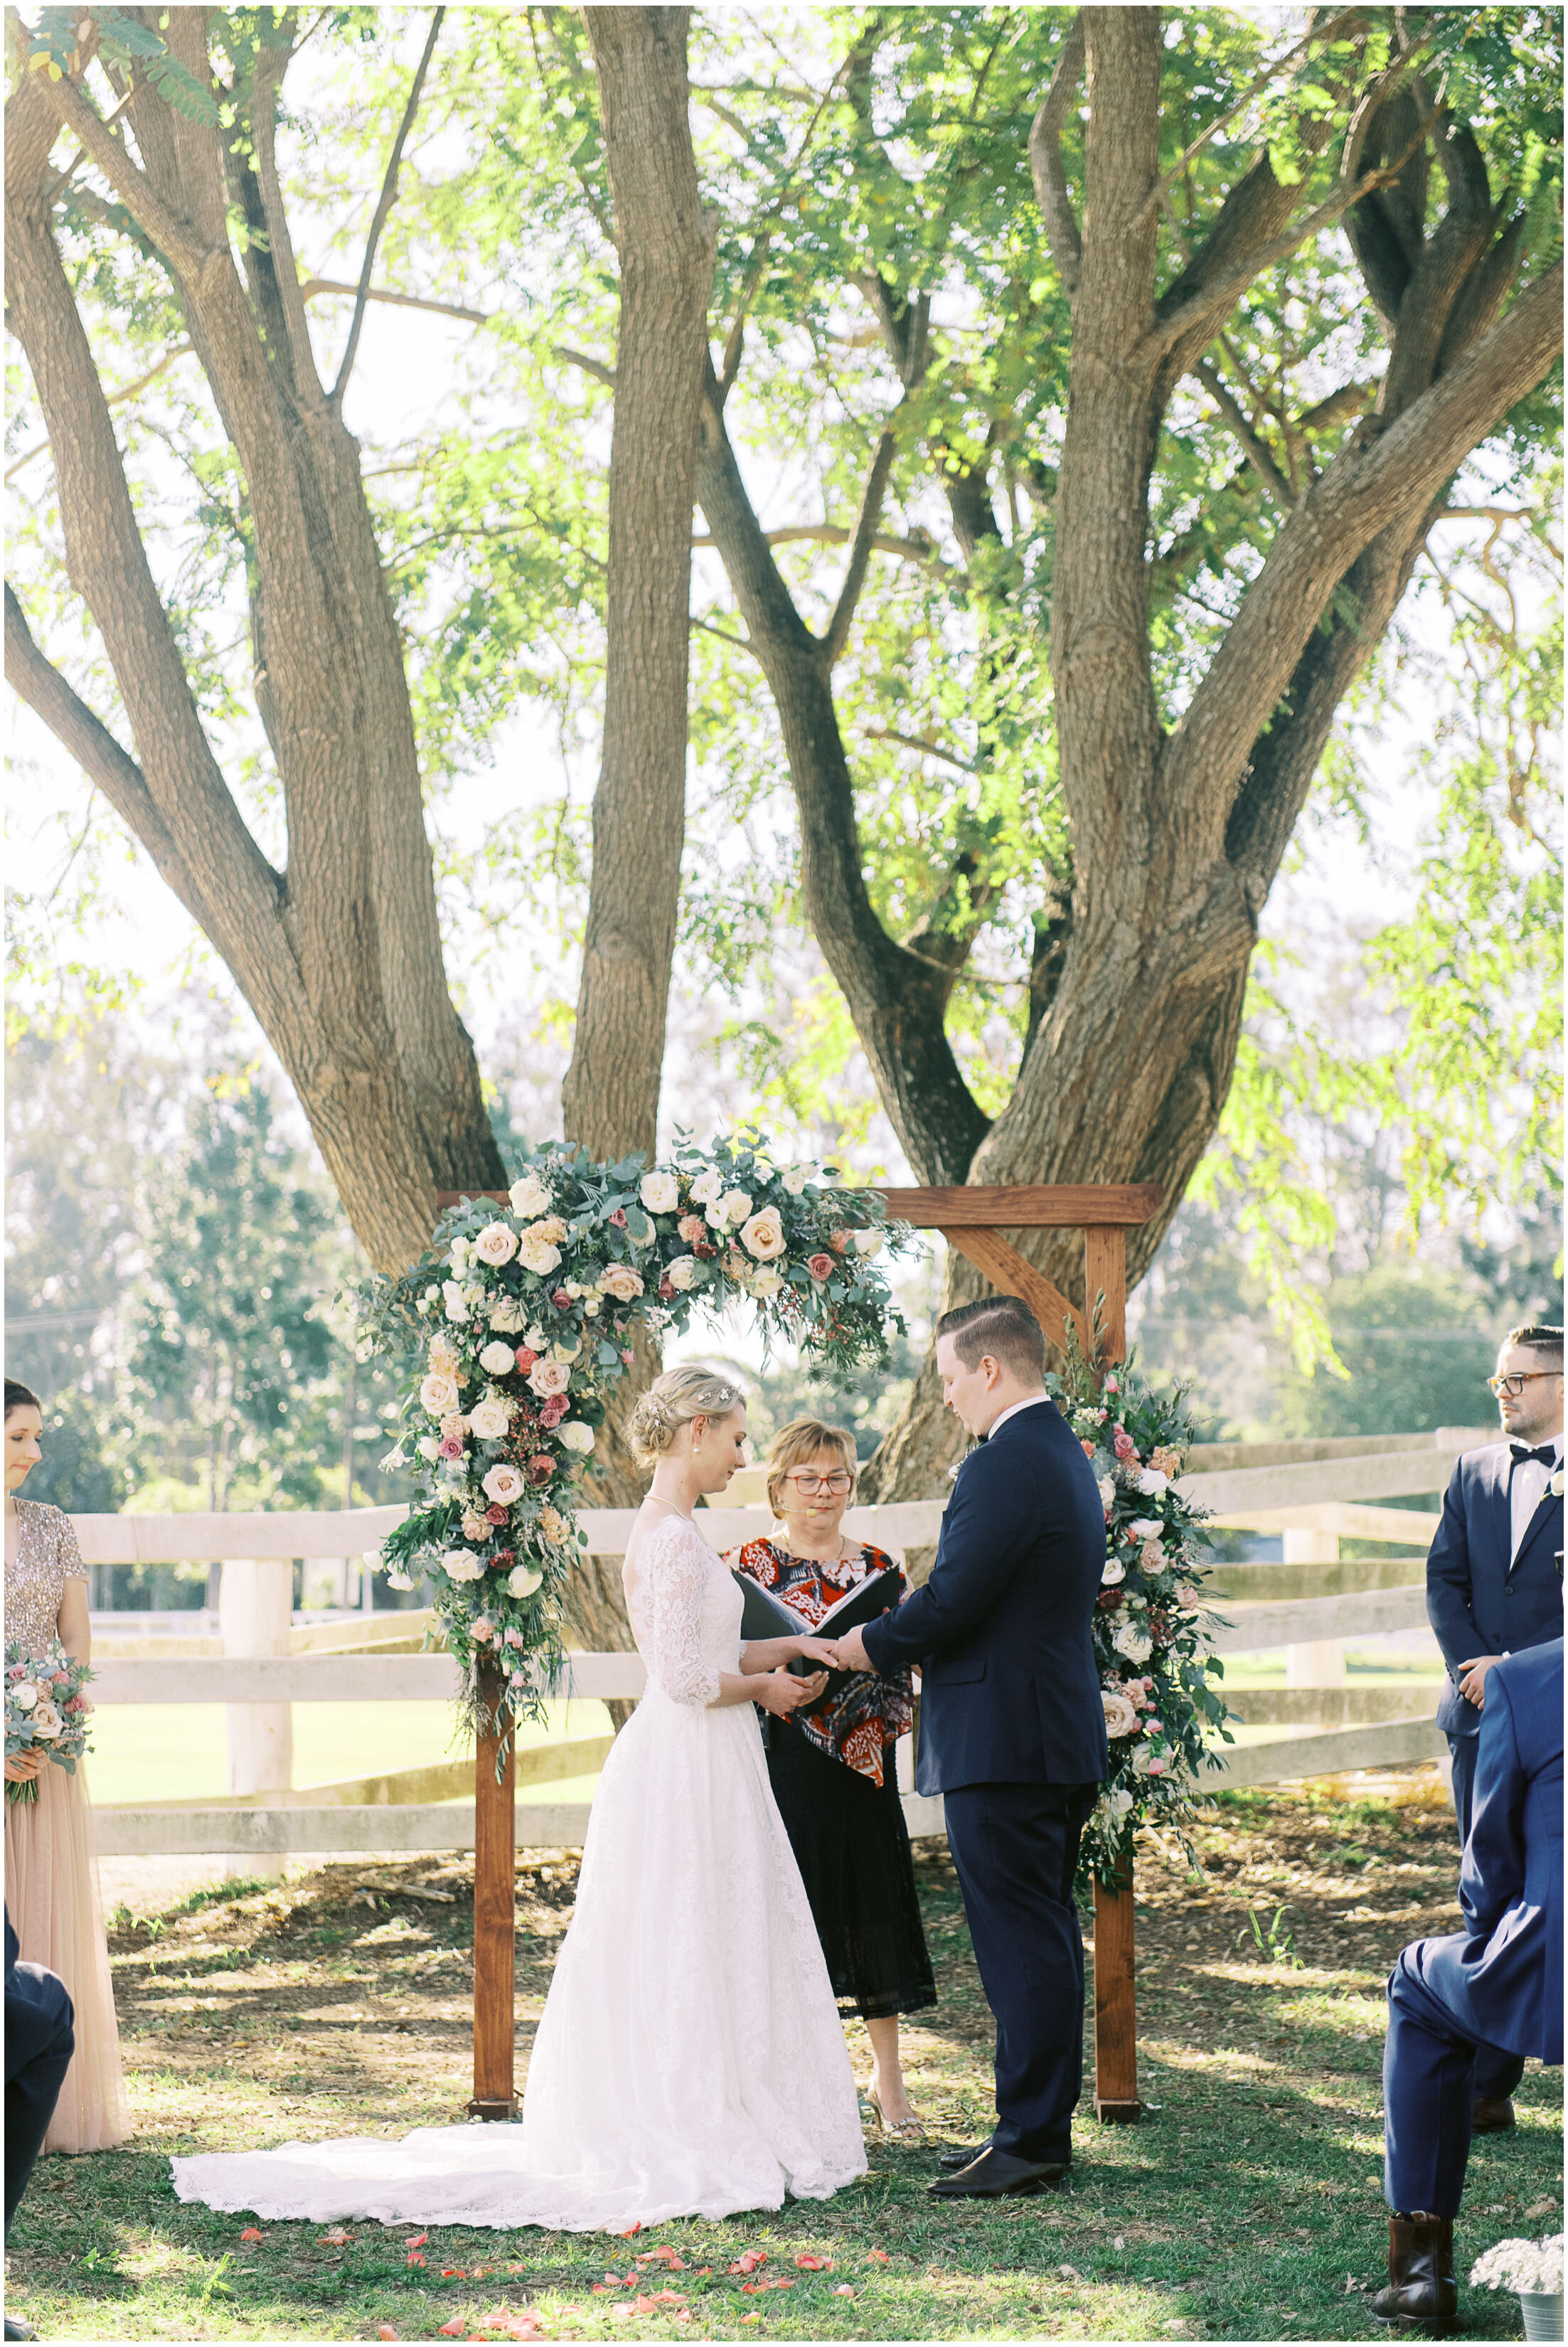 brisbane-fine-art-wedding-photographer-lauren-olivia-luxury-wedding-australia-12.jpg